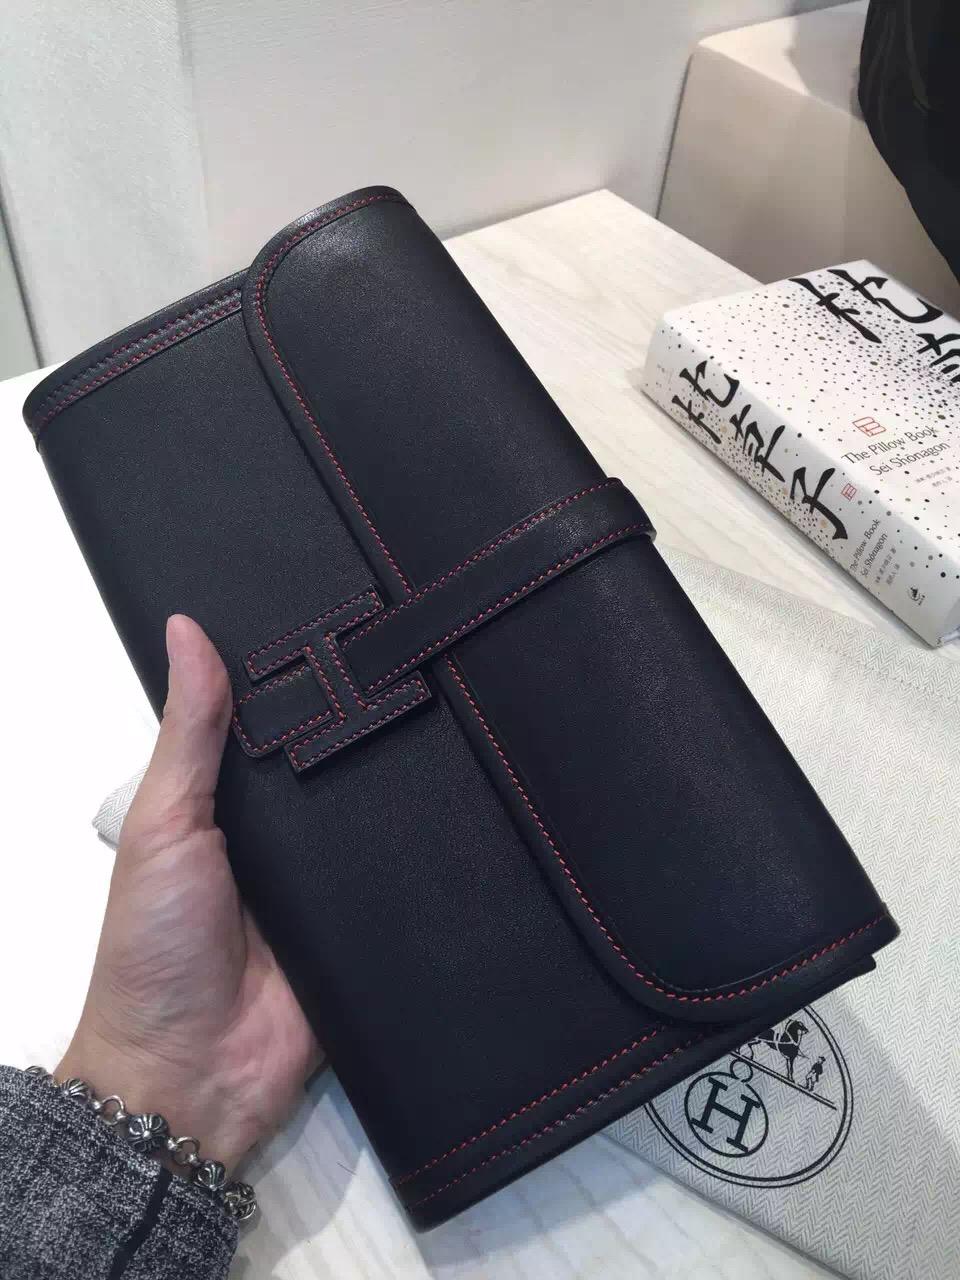 Elegant Hermes 89 Black Original Swift Leather Jige Elan Wallet Clutch Bag